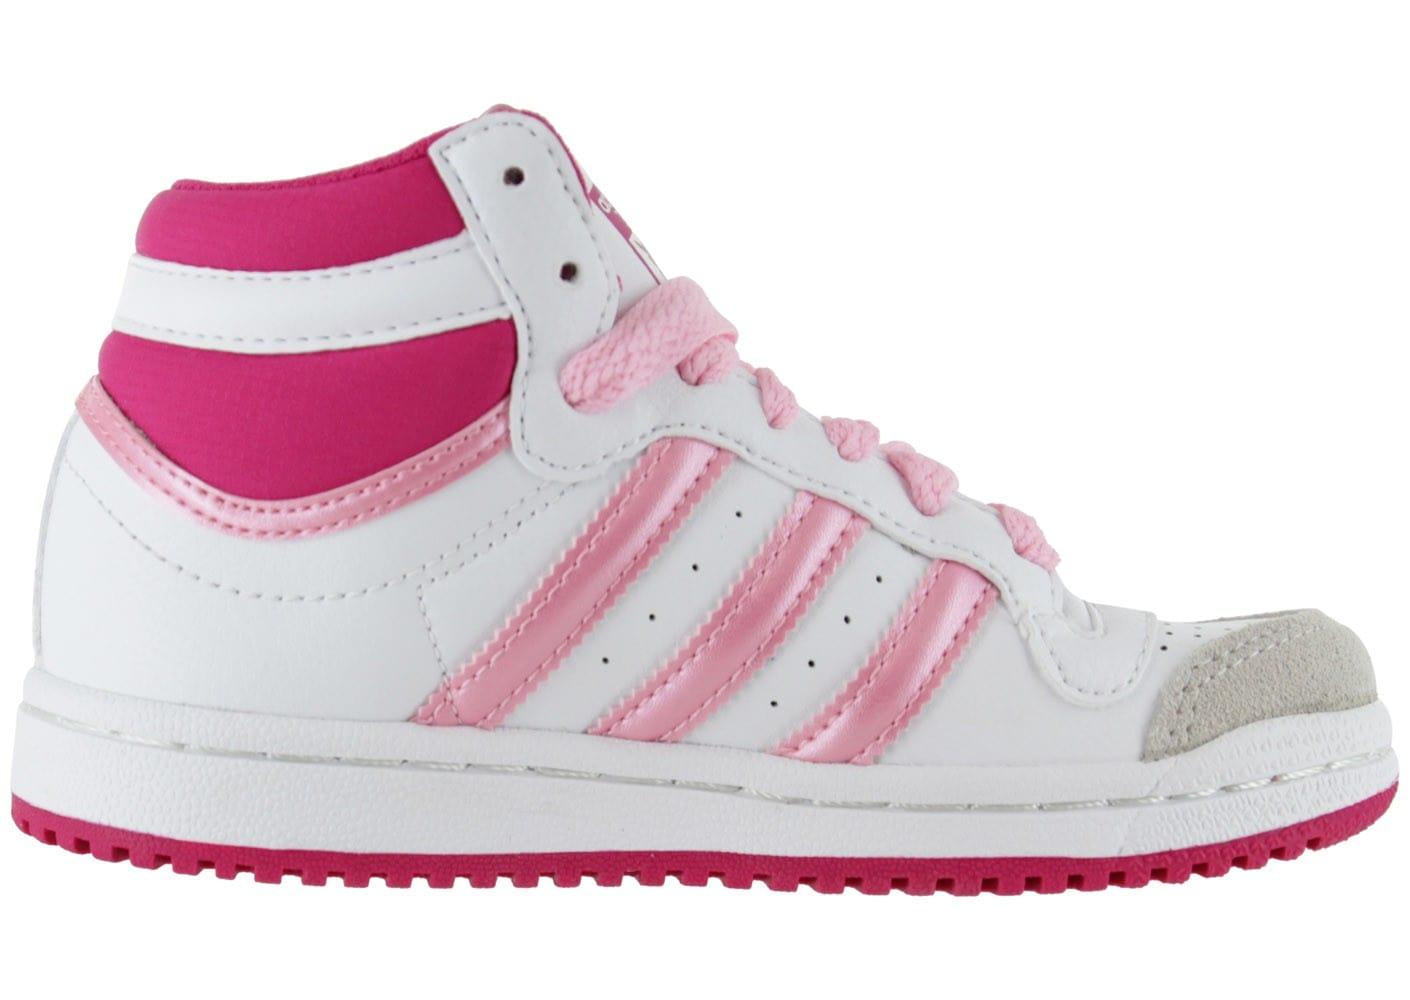 buy popular c8332 466d6 Acheter adidas top ten rose pas cher